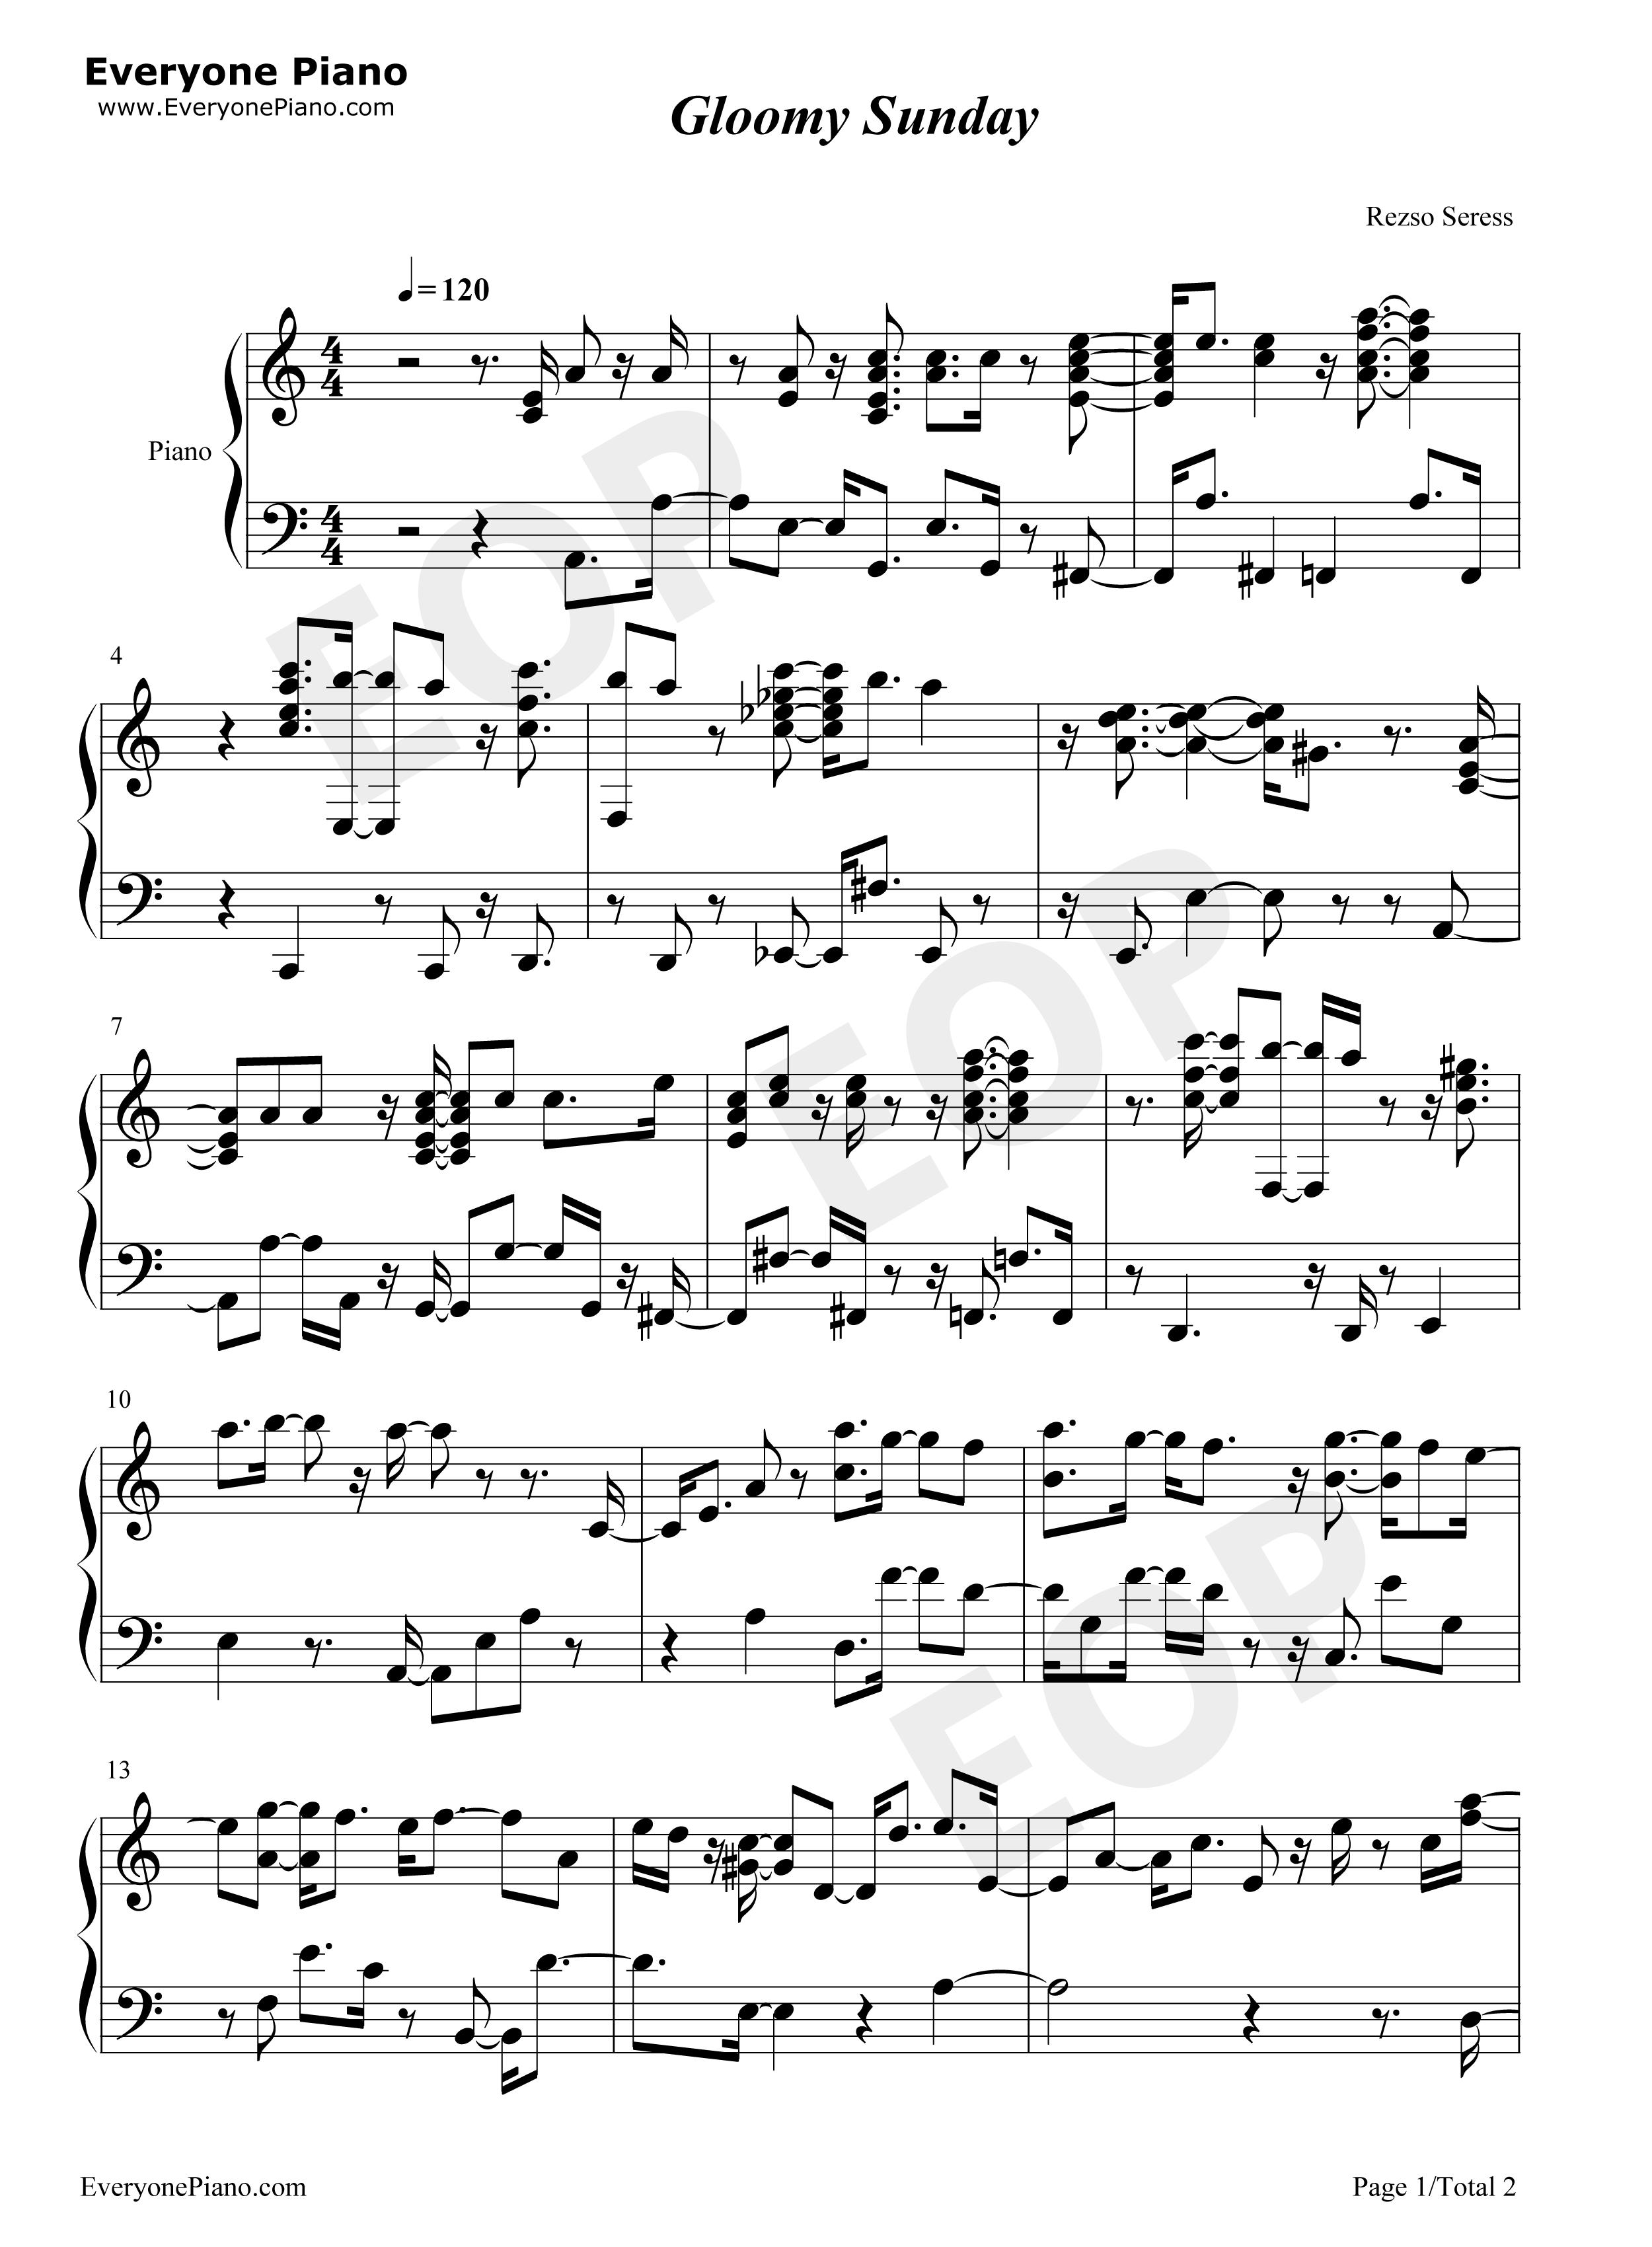 print blank music sheets